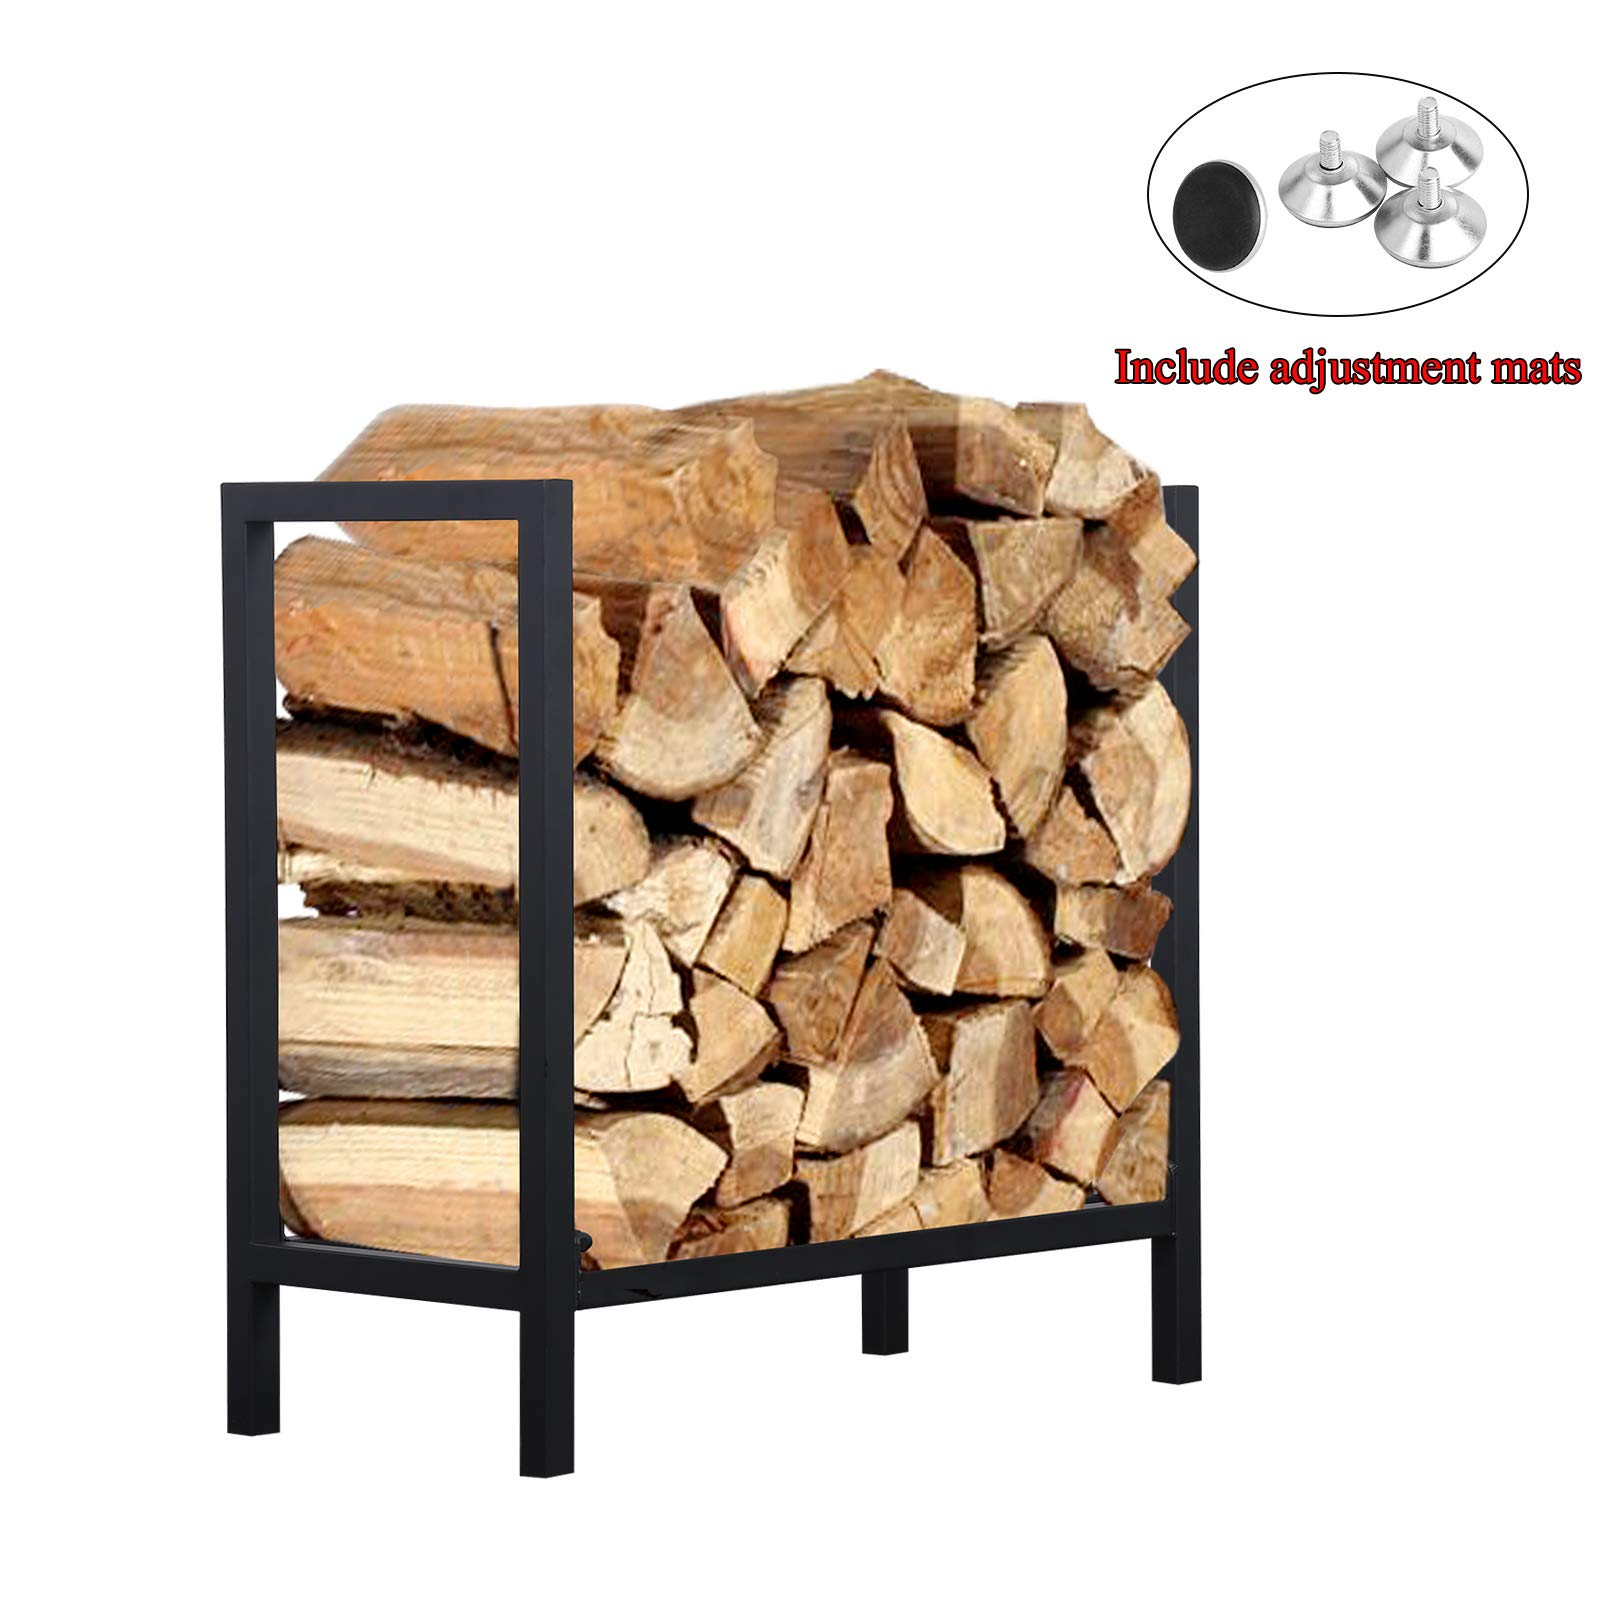 Ucared Firewood Rack Log Rack 24 Inch Indoor/Outdoor Fire Wood Storage Black Steel Firewood Log Holder by Ucared